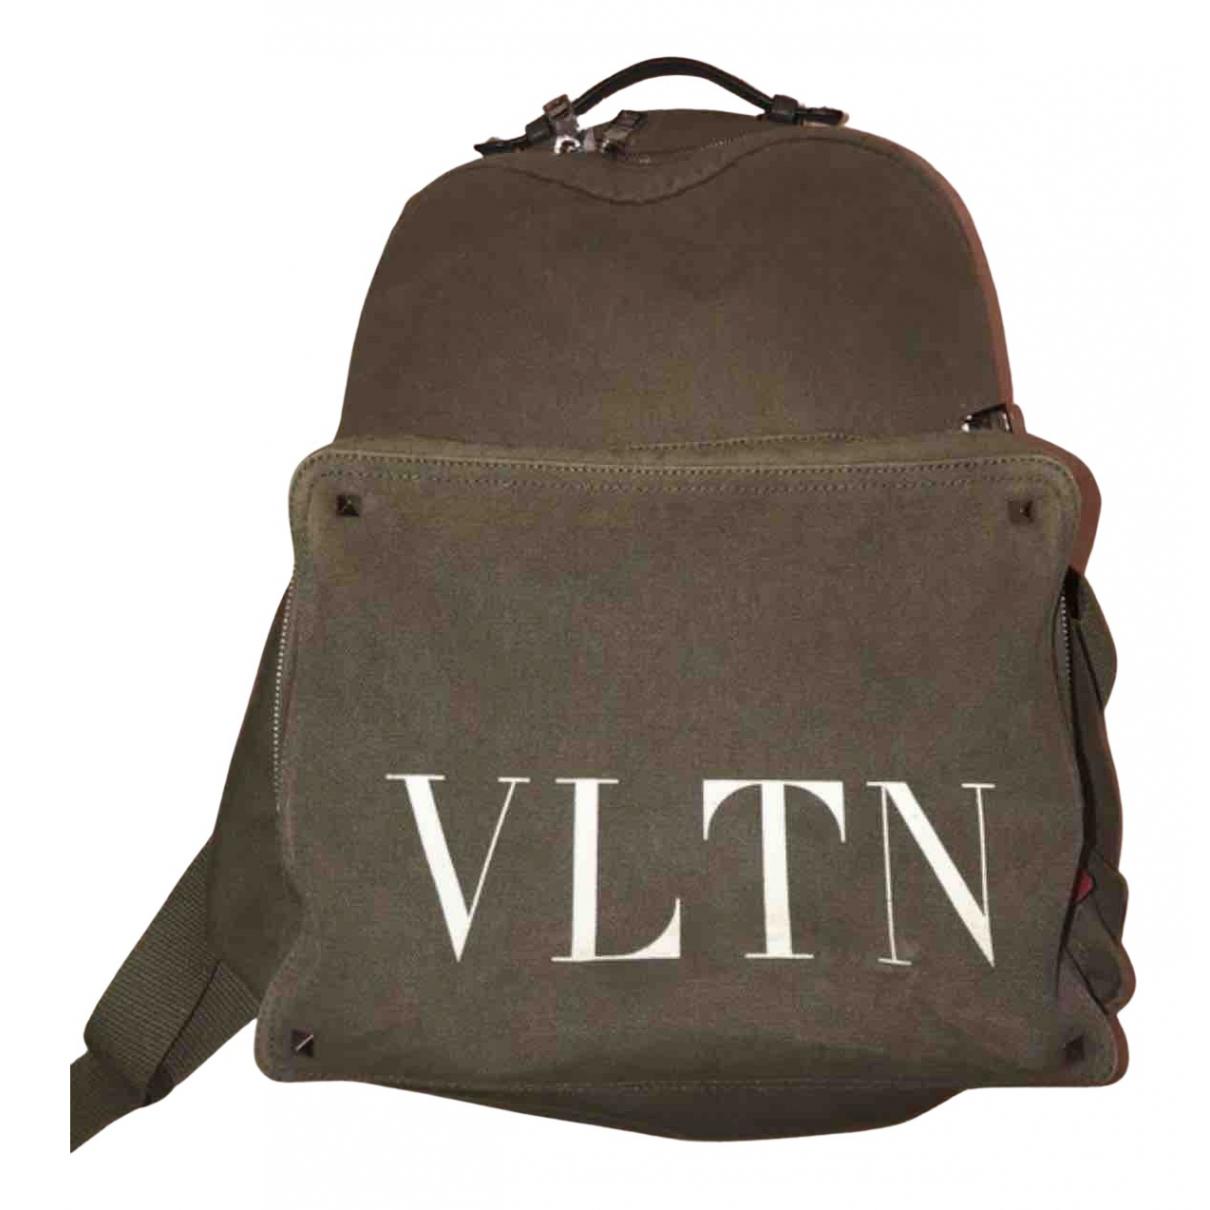 Valentino Garavani N Khaki Cotton bag for Men N